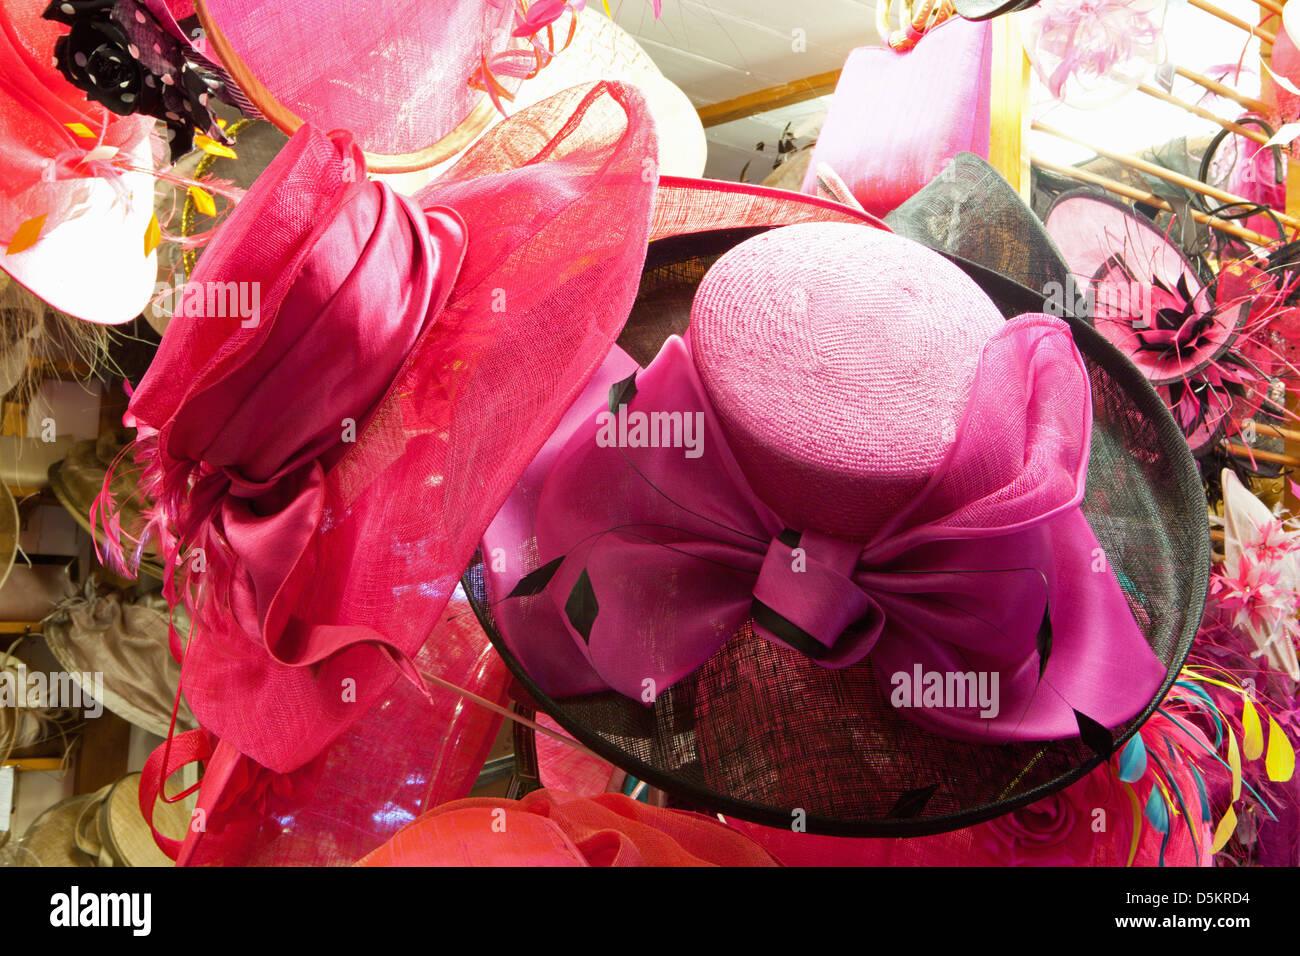 HAT; HATS; SHOP; CHOICE; DETAILS; MILLINERY; WEDDING; SMART; FORMAL; WEAR - Stock Image